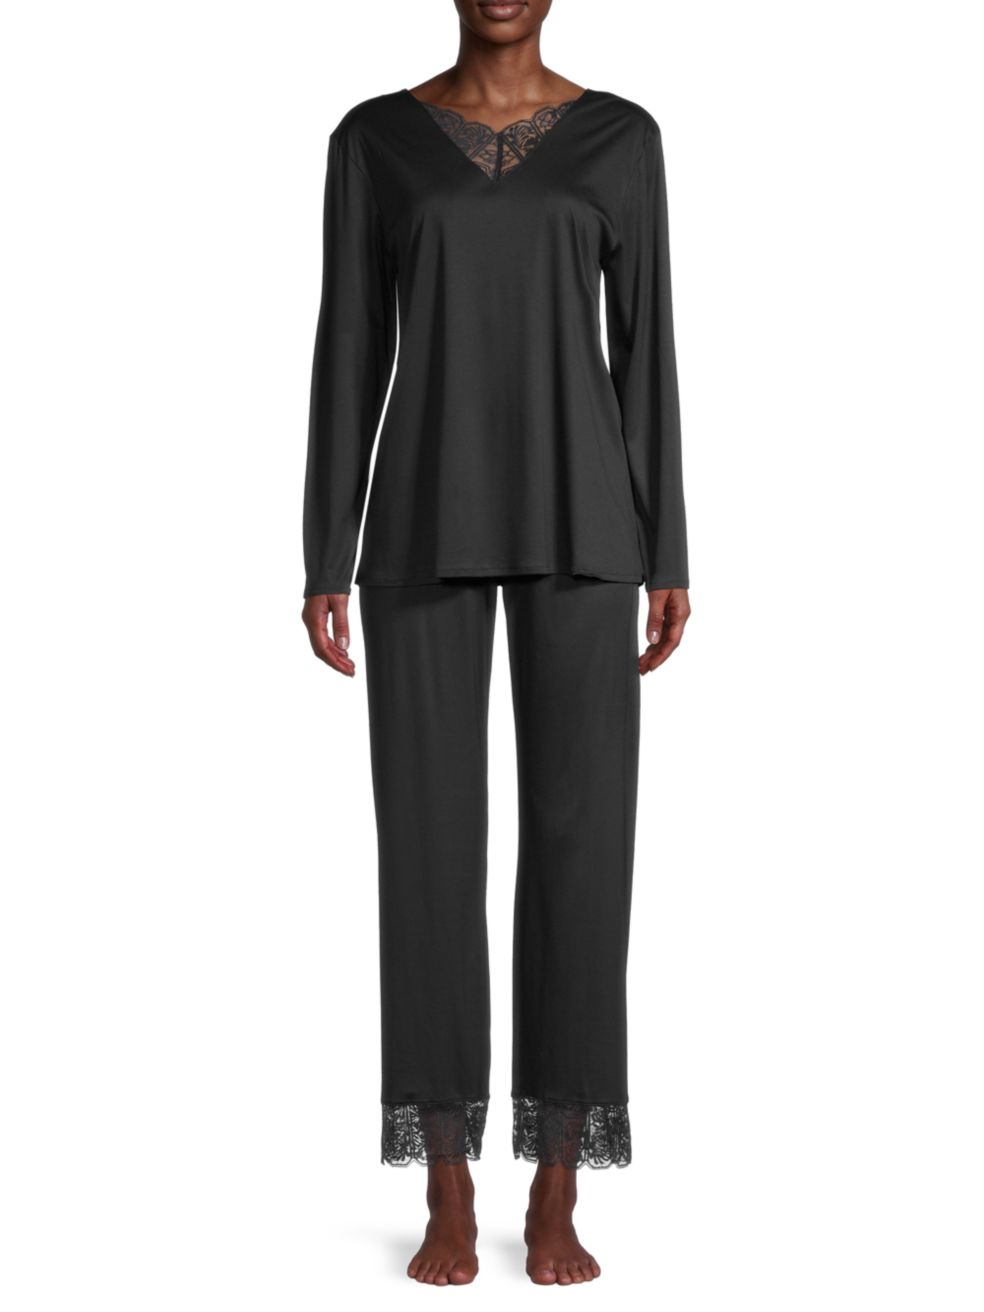 Hanro Wanda 2-Piece Lace Panel Long Pajama Set | SaksFifthAvenue